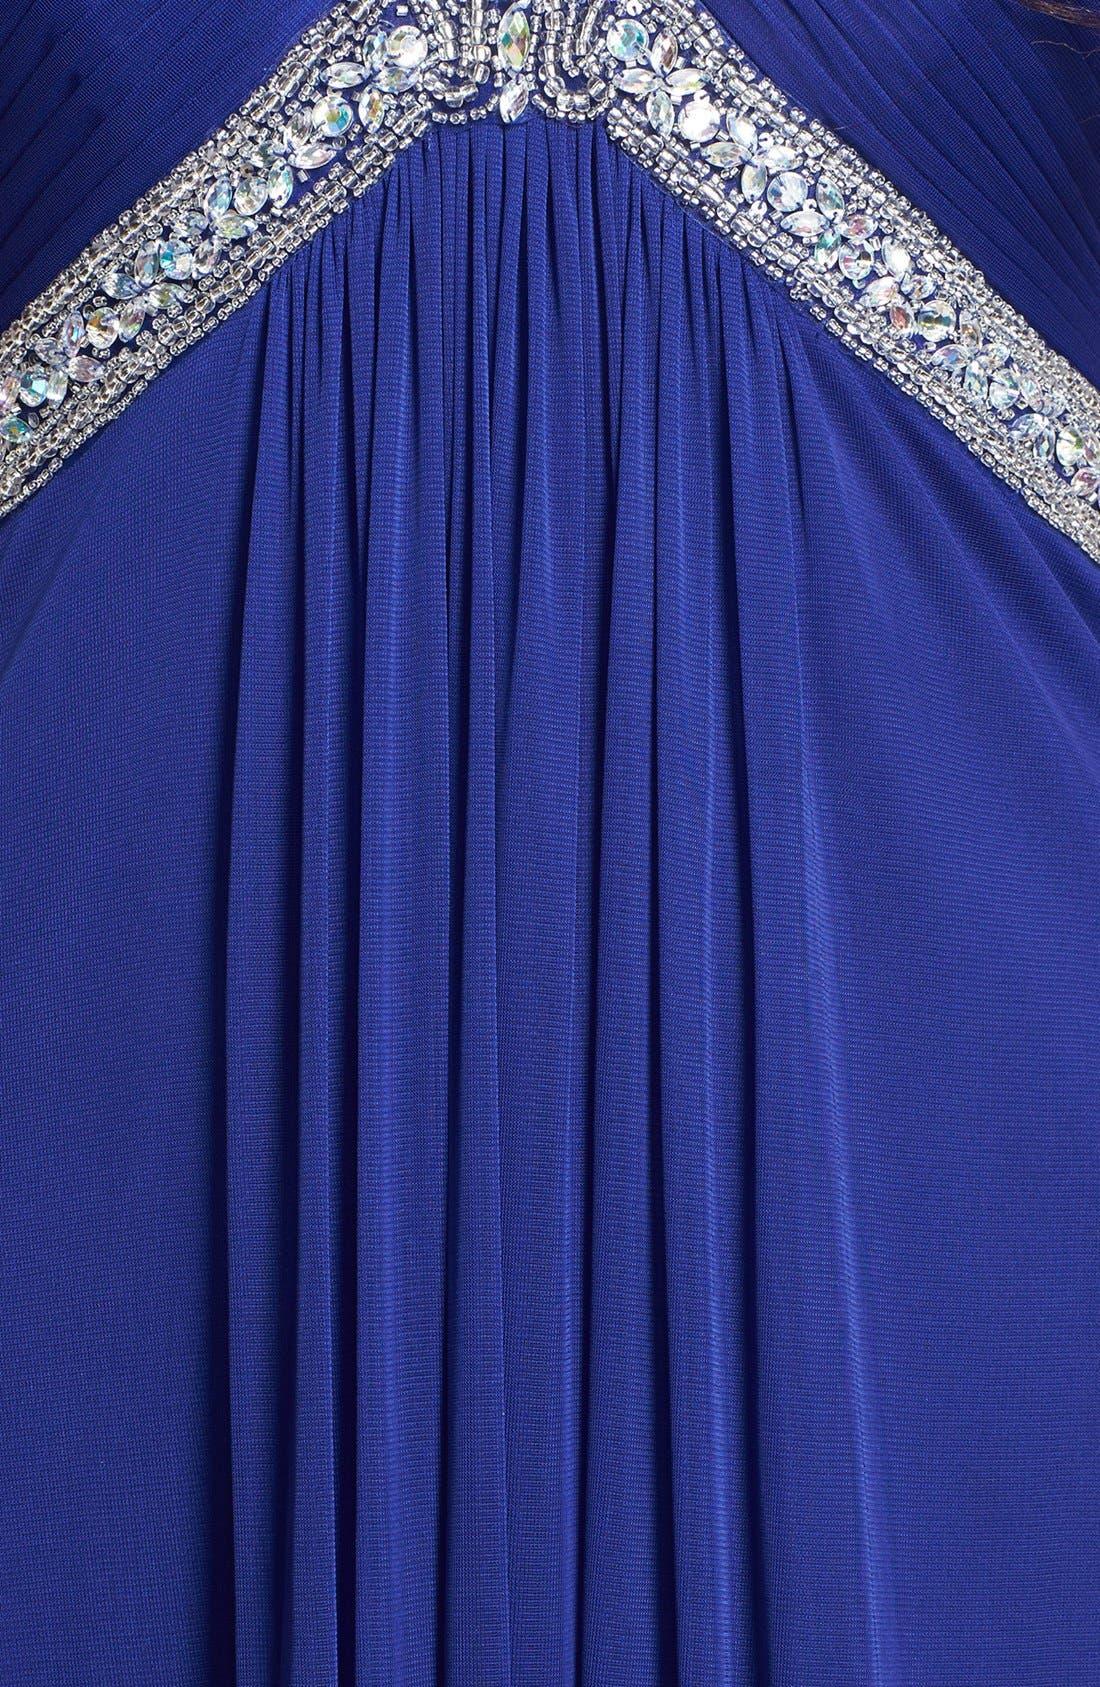 Alternate Image 3  - Xscape Embellished Chiffon Mesh Gown